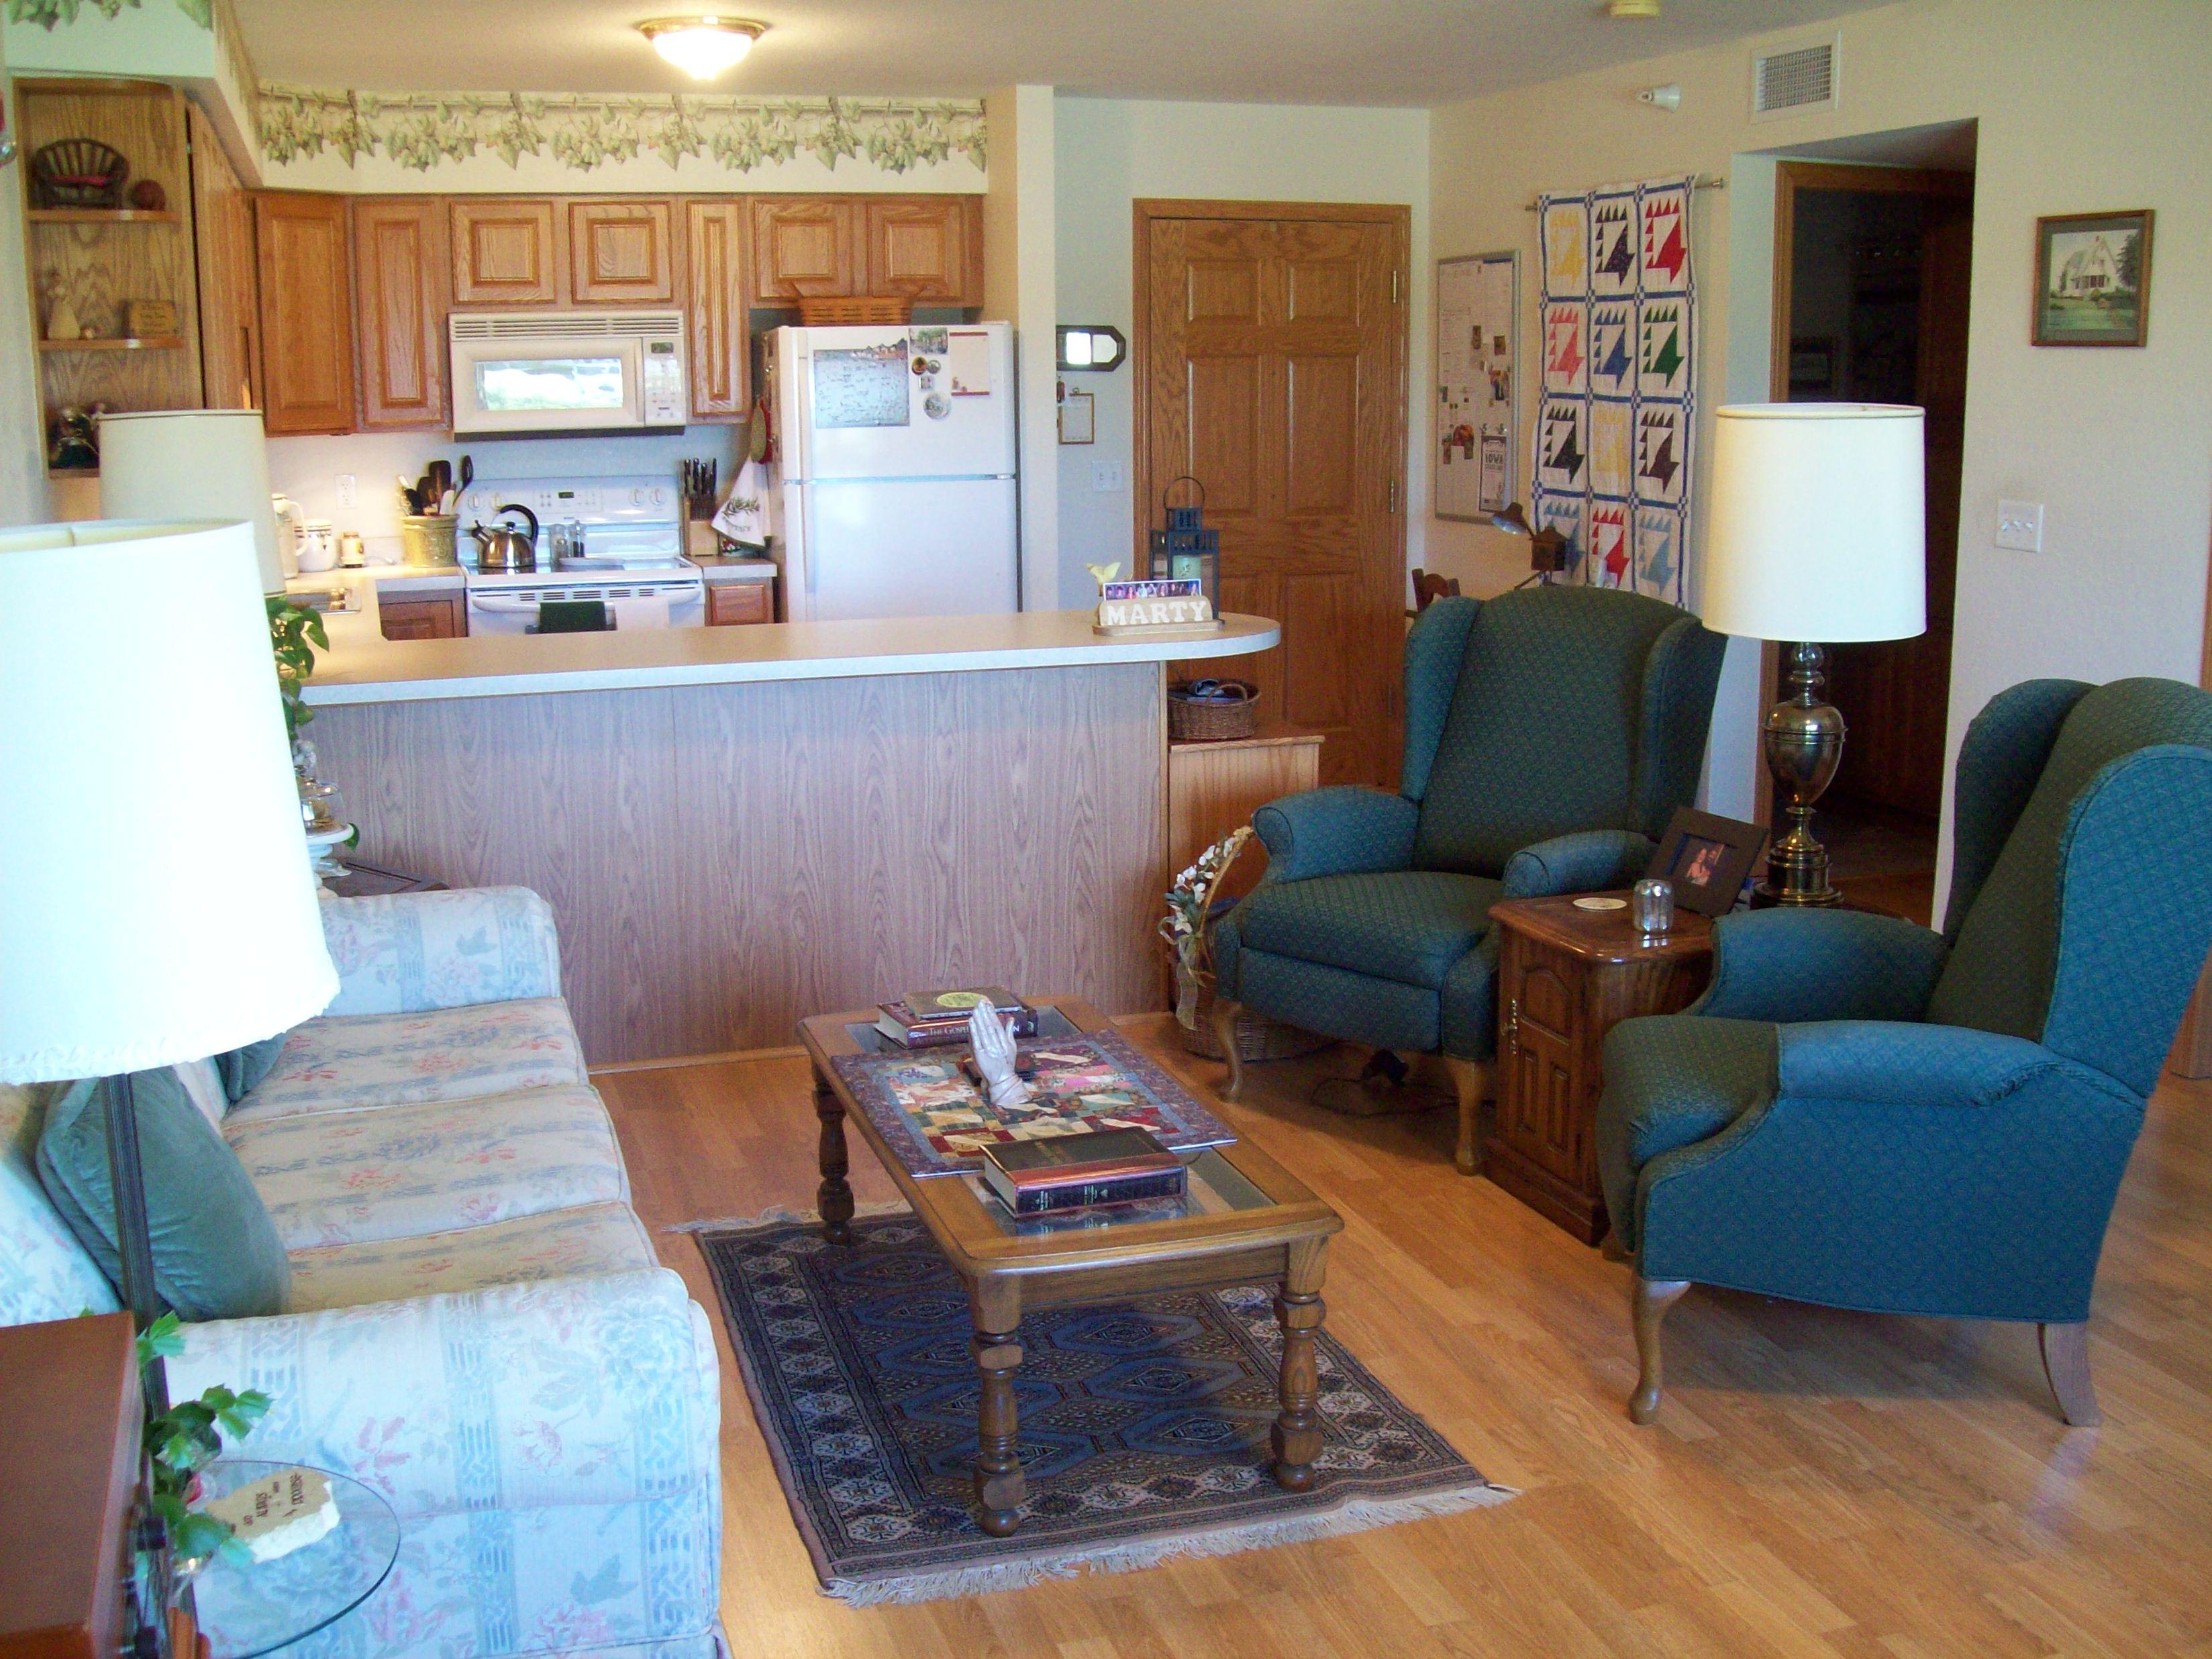 Home Interiors Furniture And Design Cedar Falls Ia ~ Home interiors cedar falls images interior